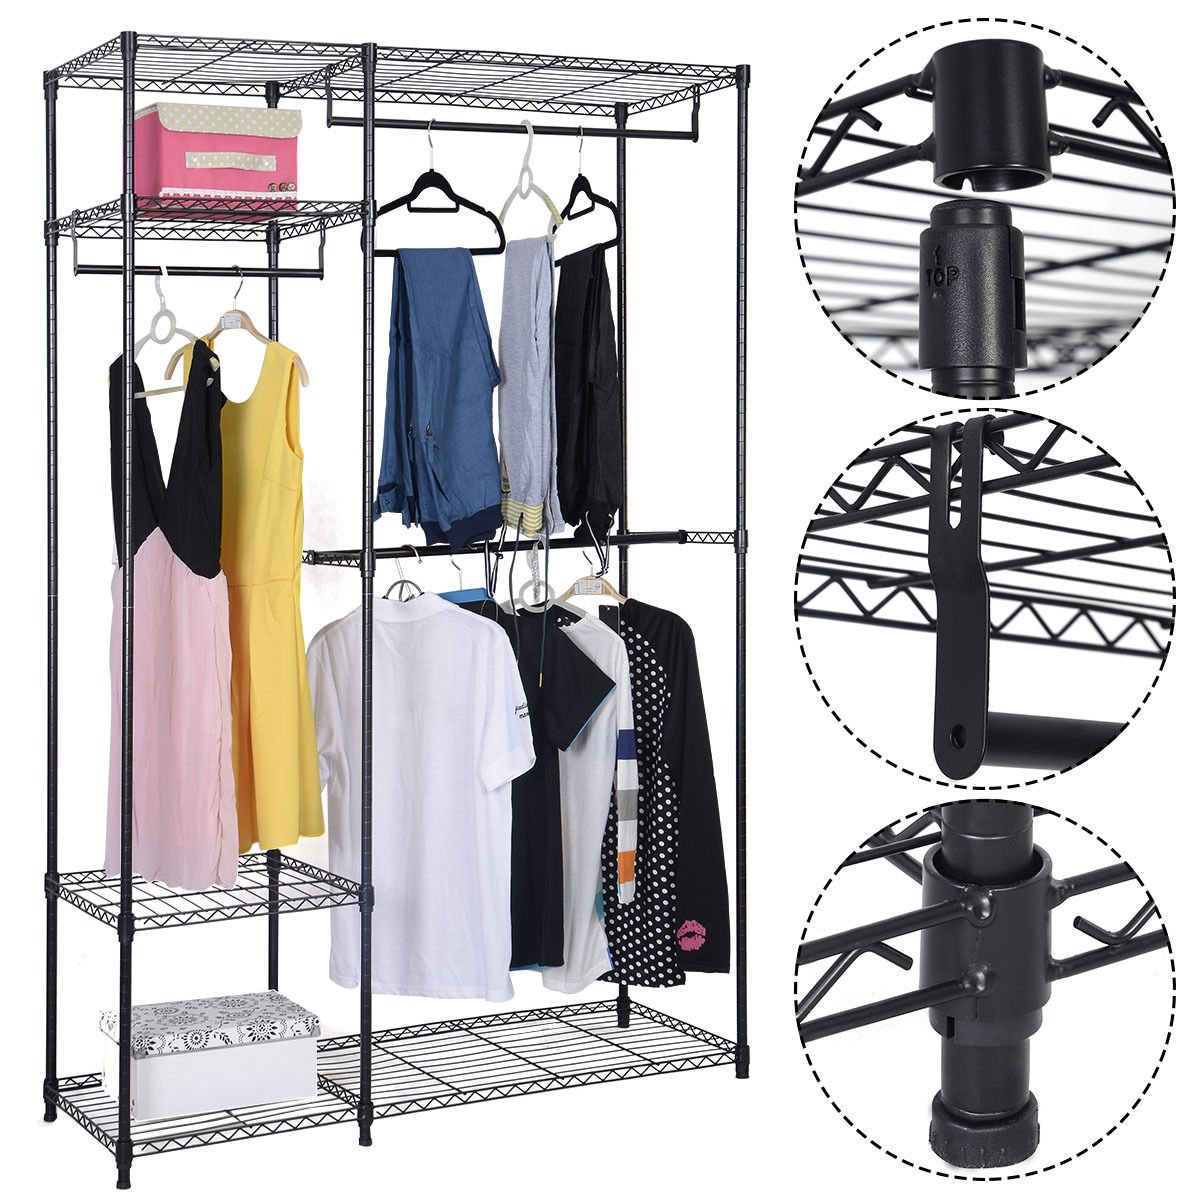 48''x18''x71'' Closet Organizer Garment Rack Portable Clothes Hanger Home Shelf